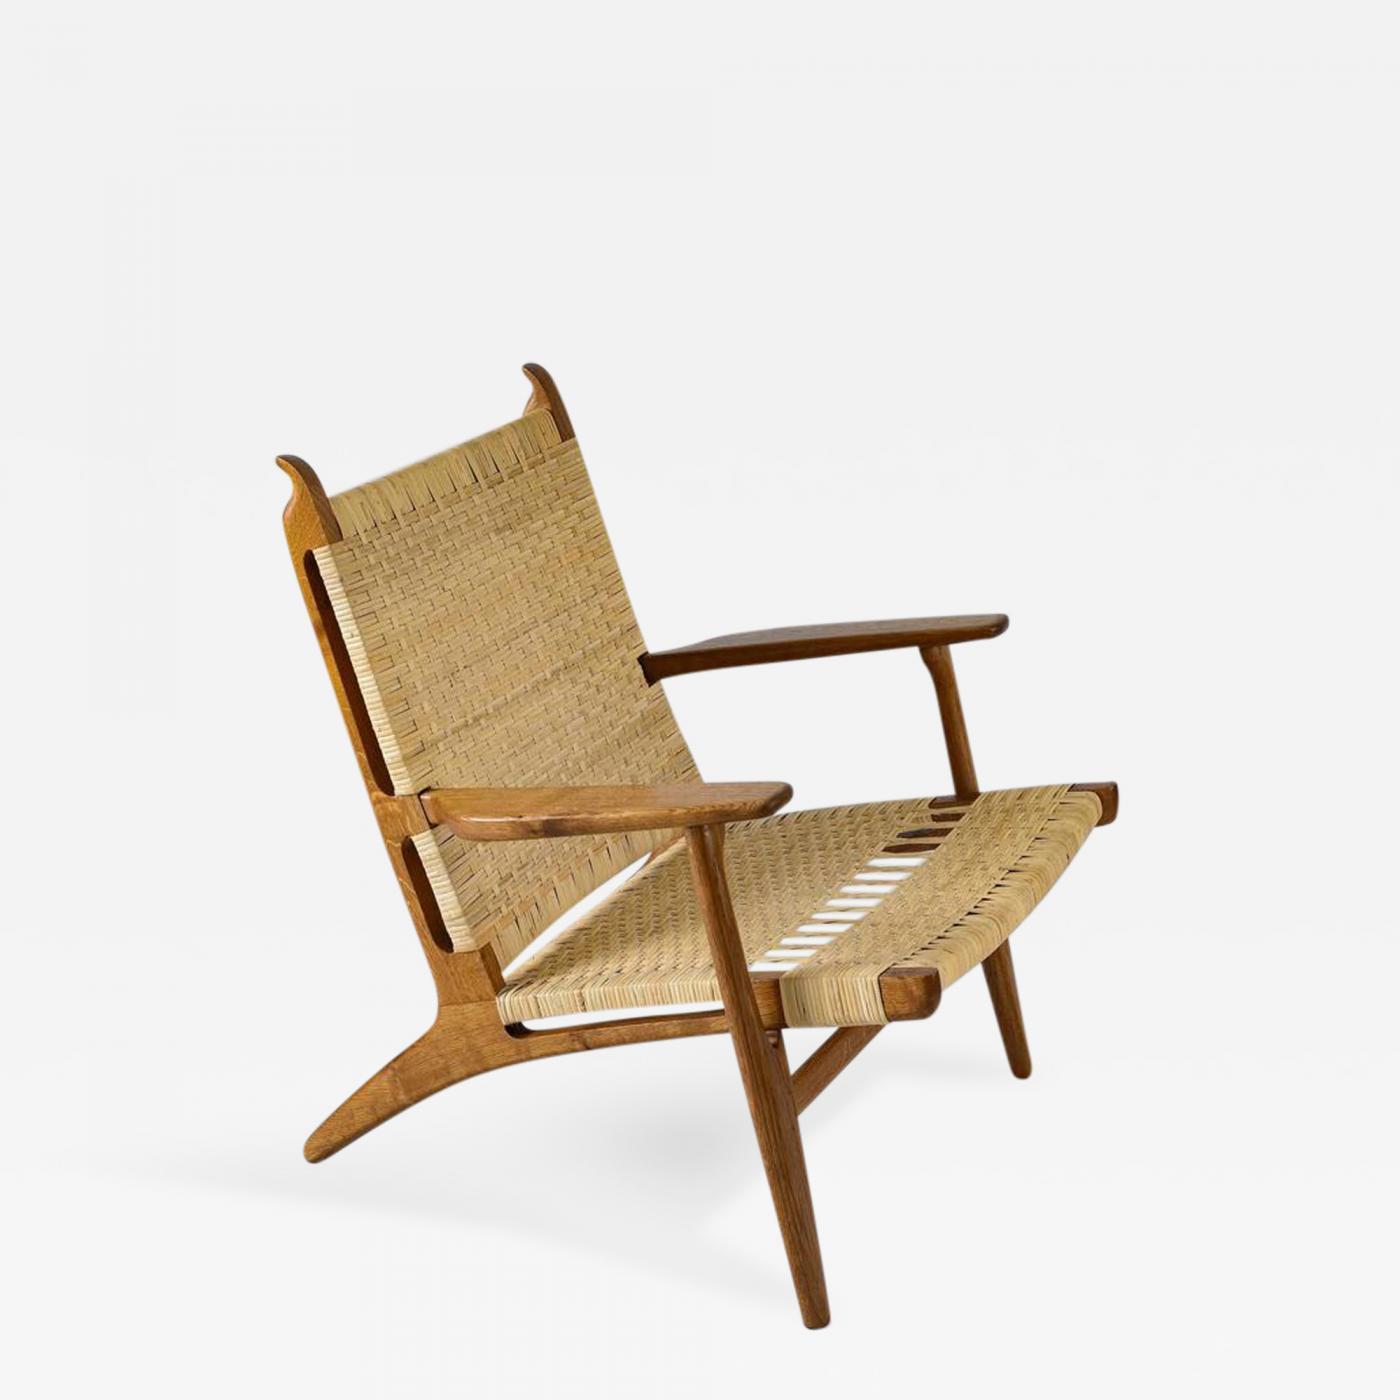 hans wegner hans wegner ch 27 lounge chair. Black Bedroom Furniture Sets. Home Design Ideas